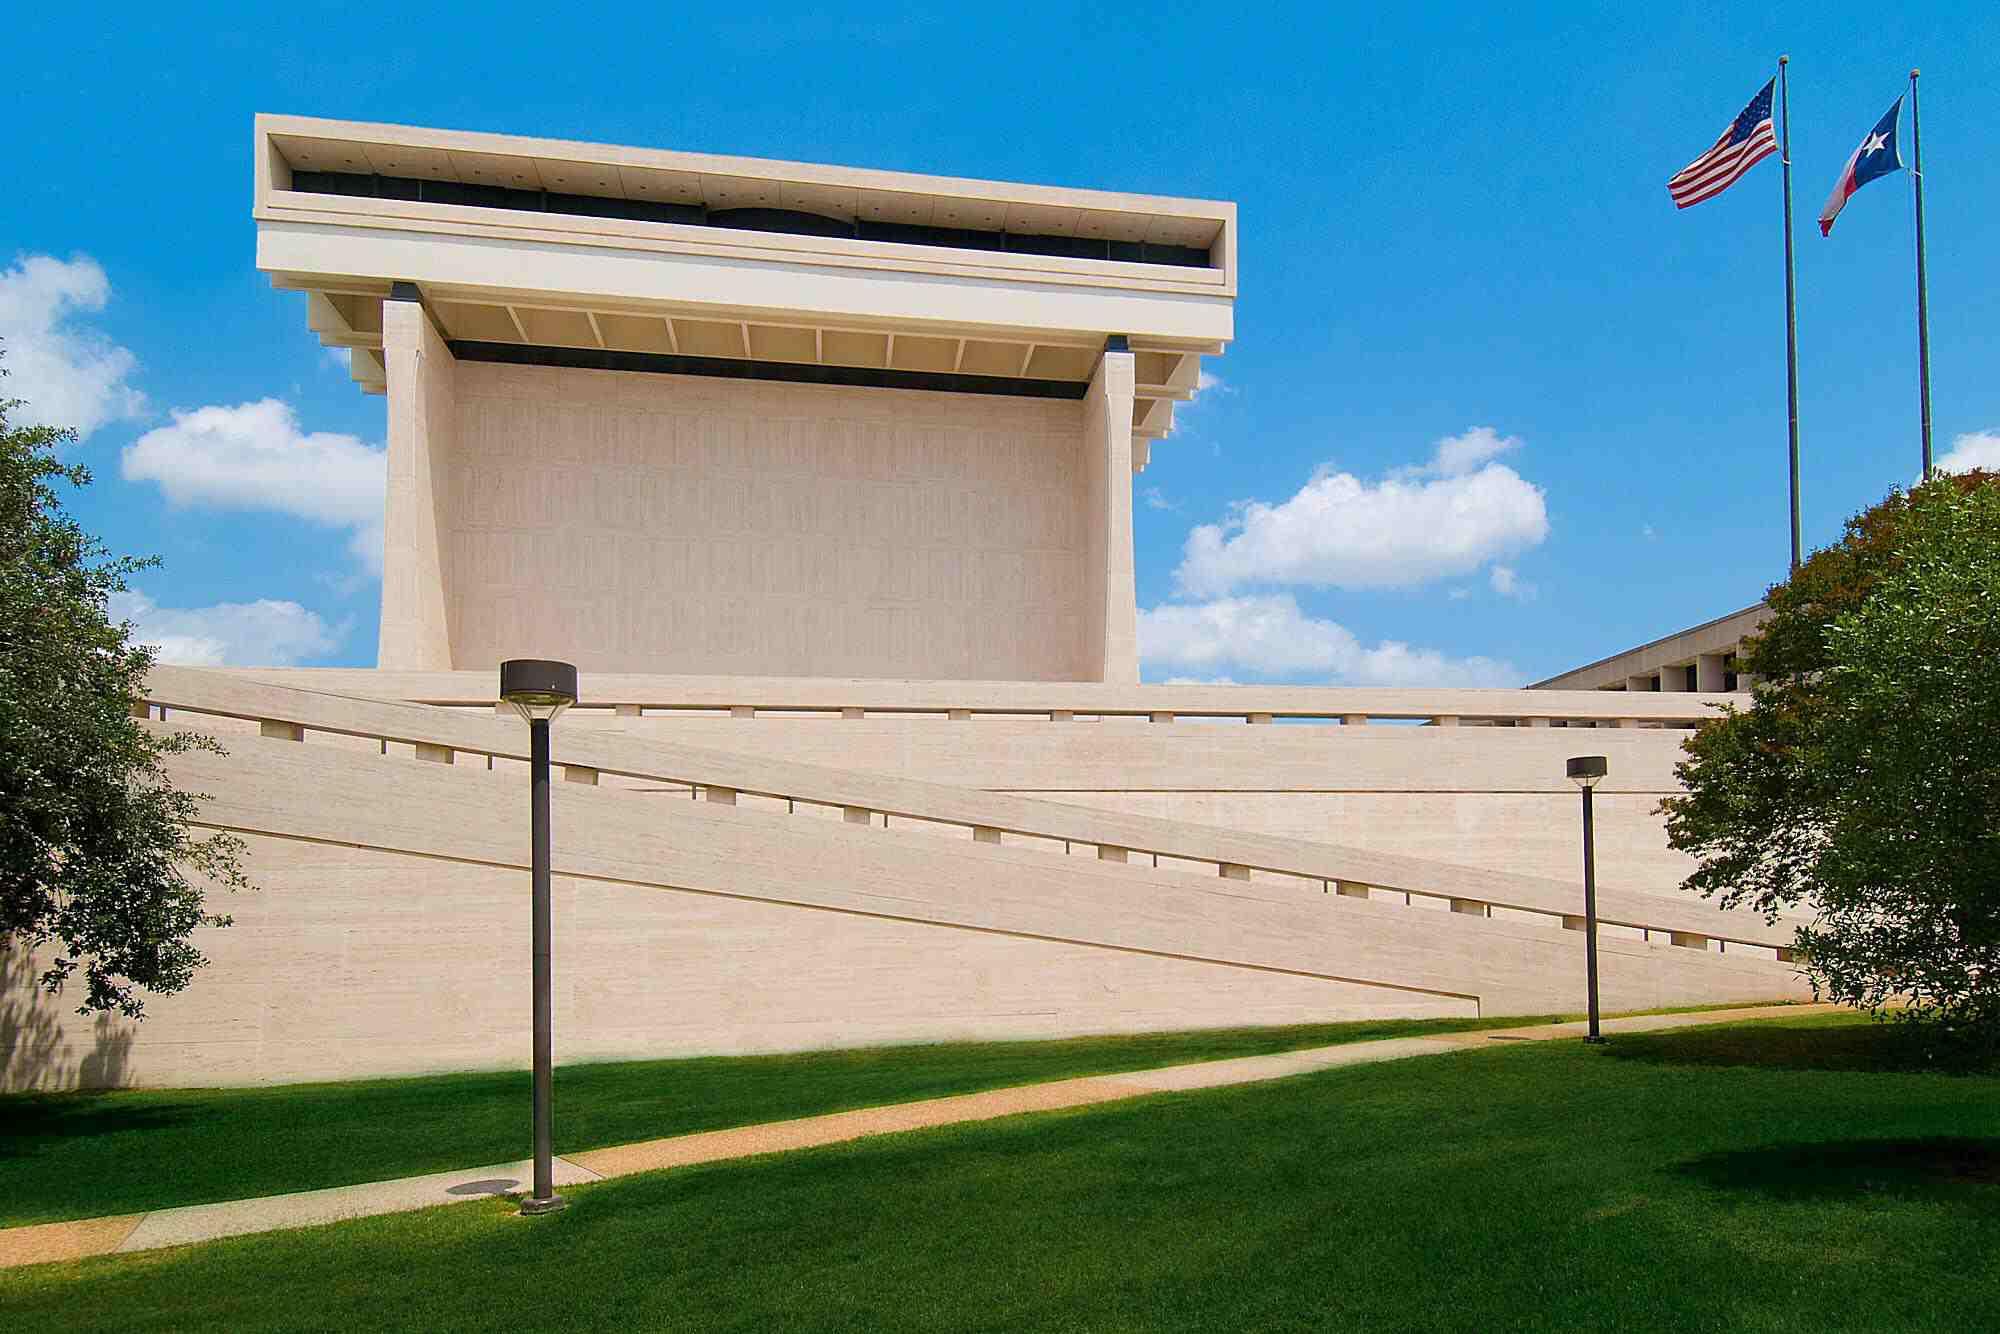 LBJ Library, built 1971, designed by Gordon Bunshaft, University of Texas campus in Austin, Texas